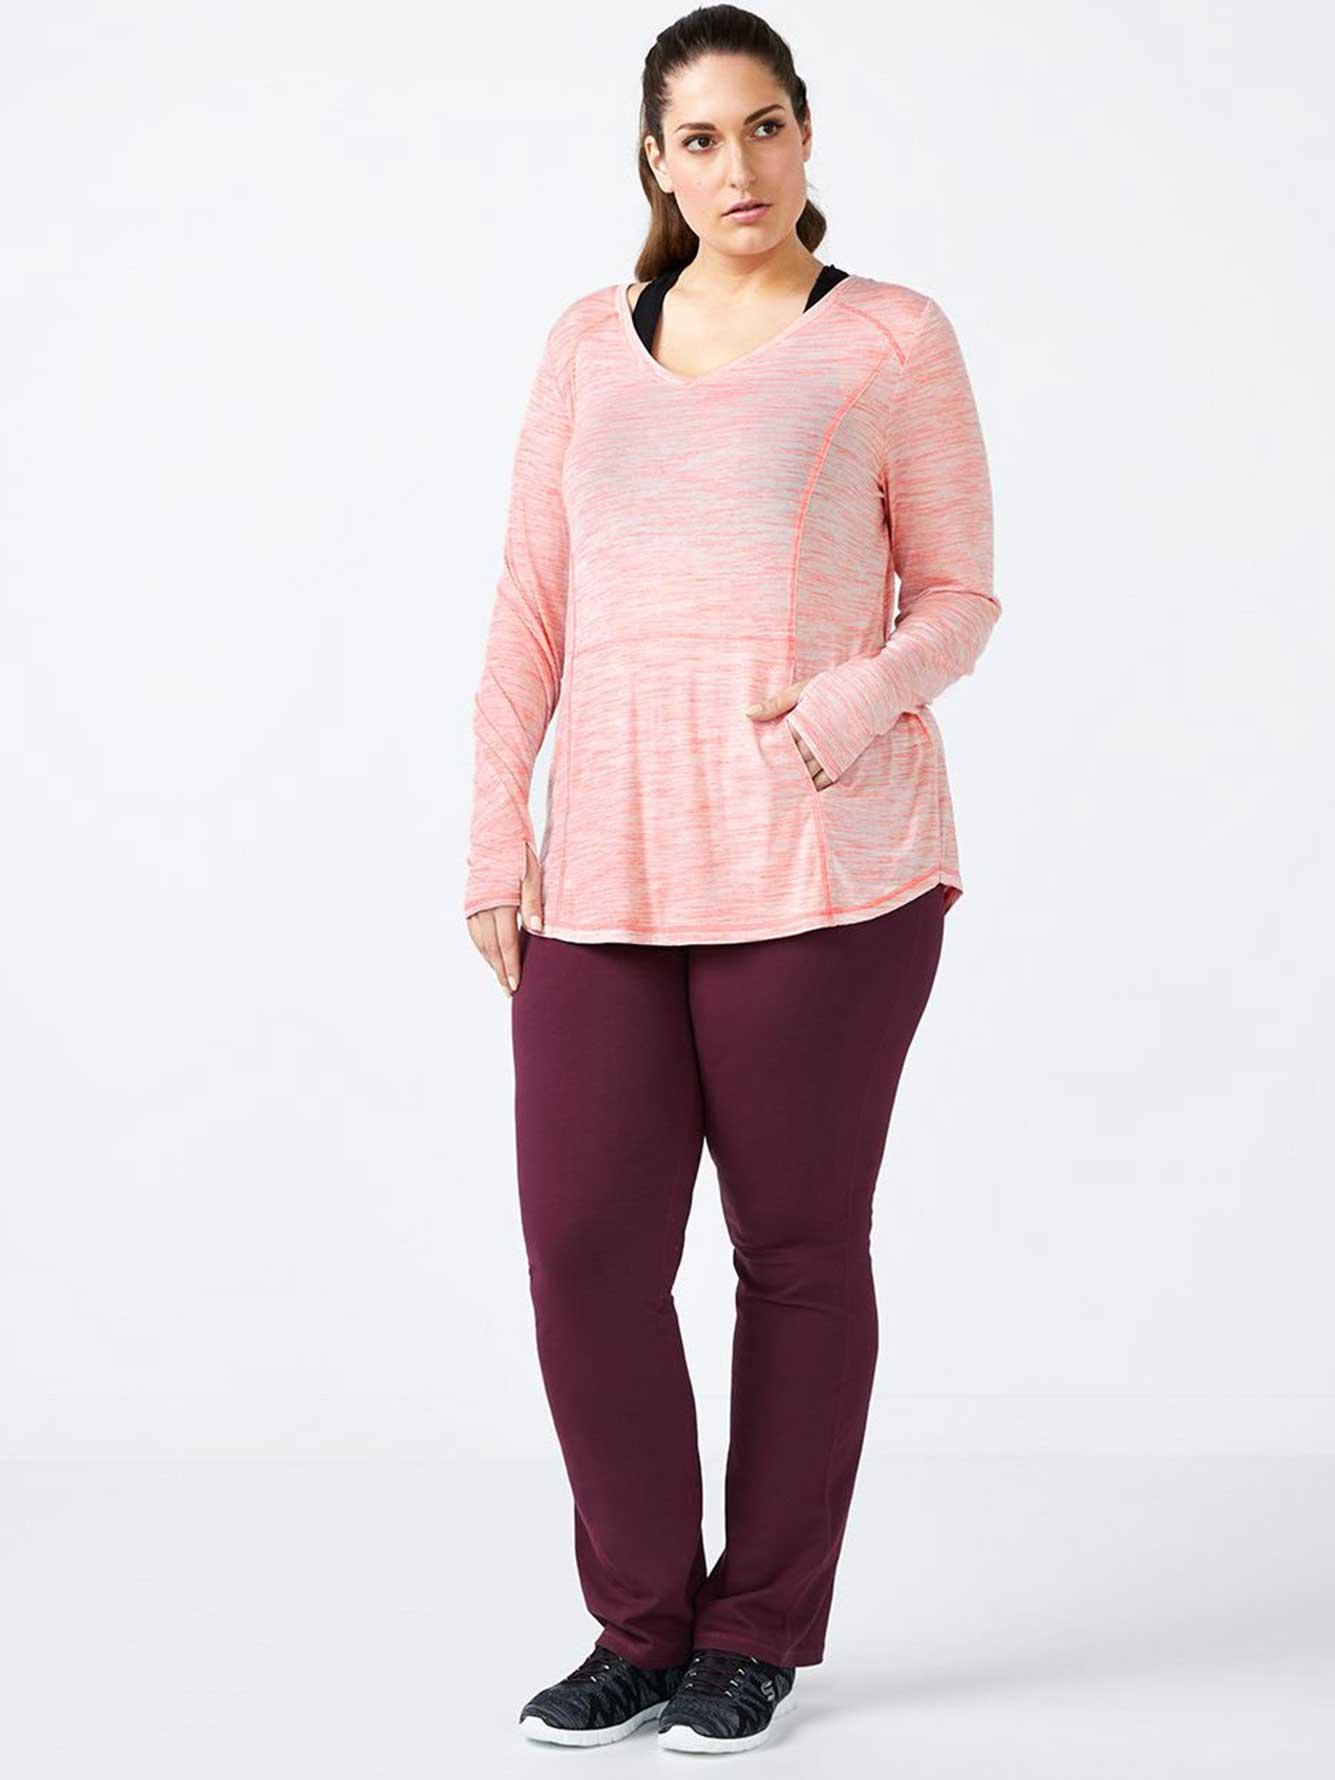 379946a9af7 ONLINE ONLY - Plus-Size Yoga Pant - Essentials